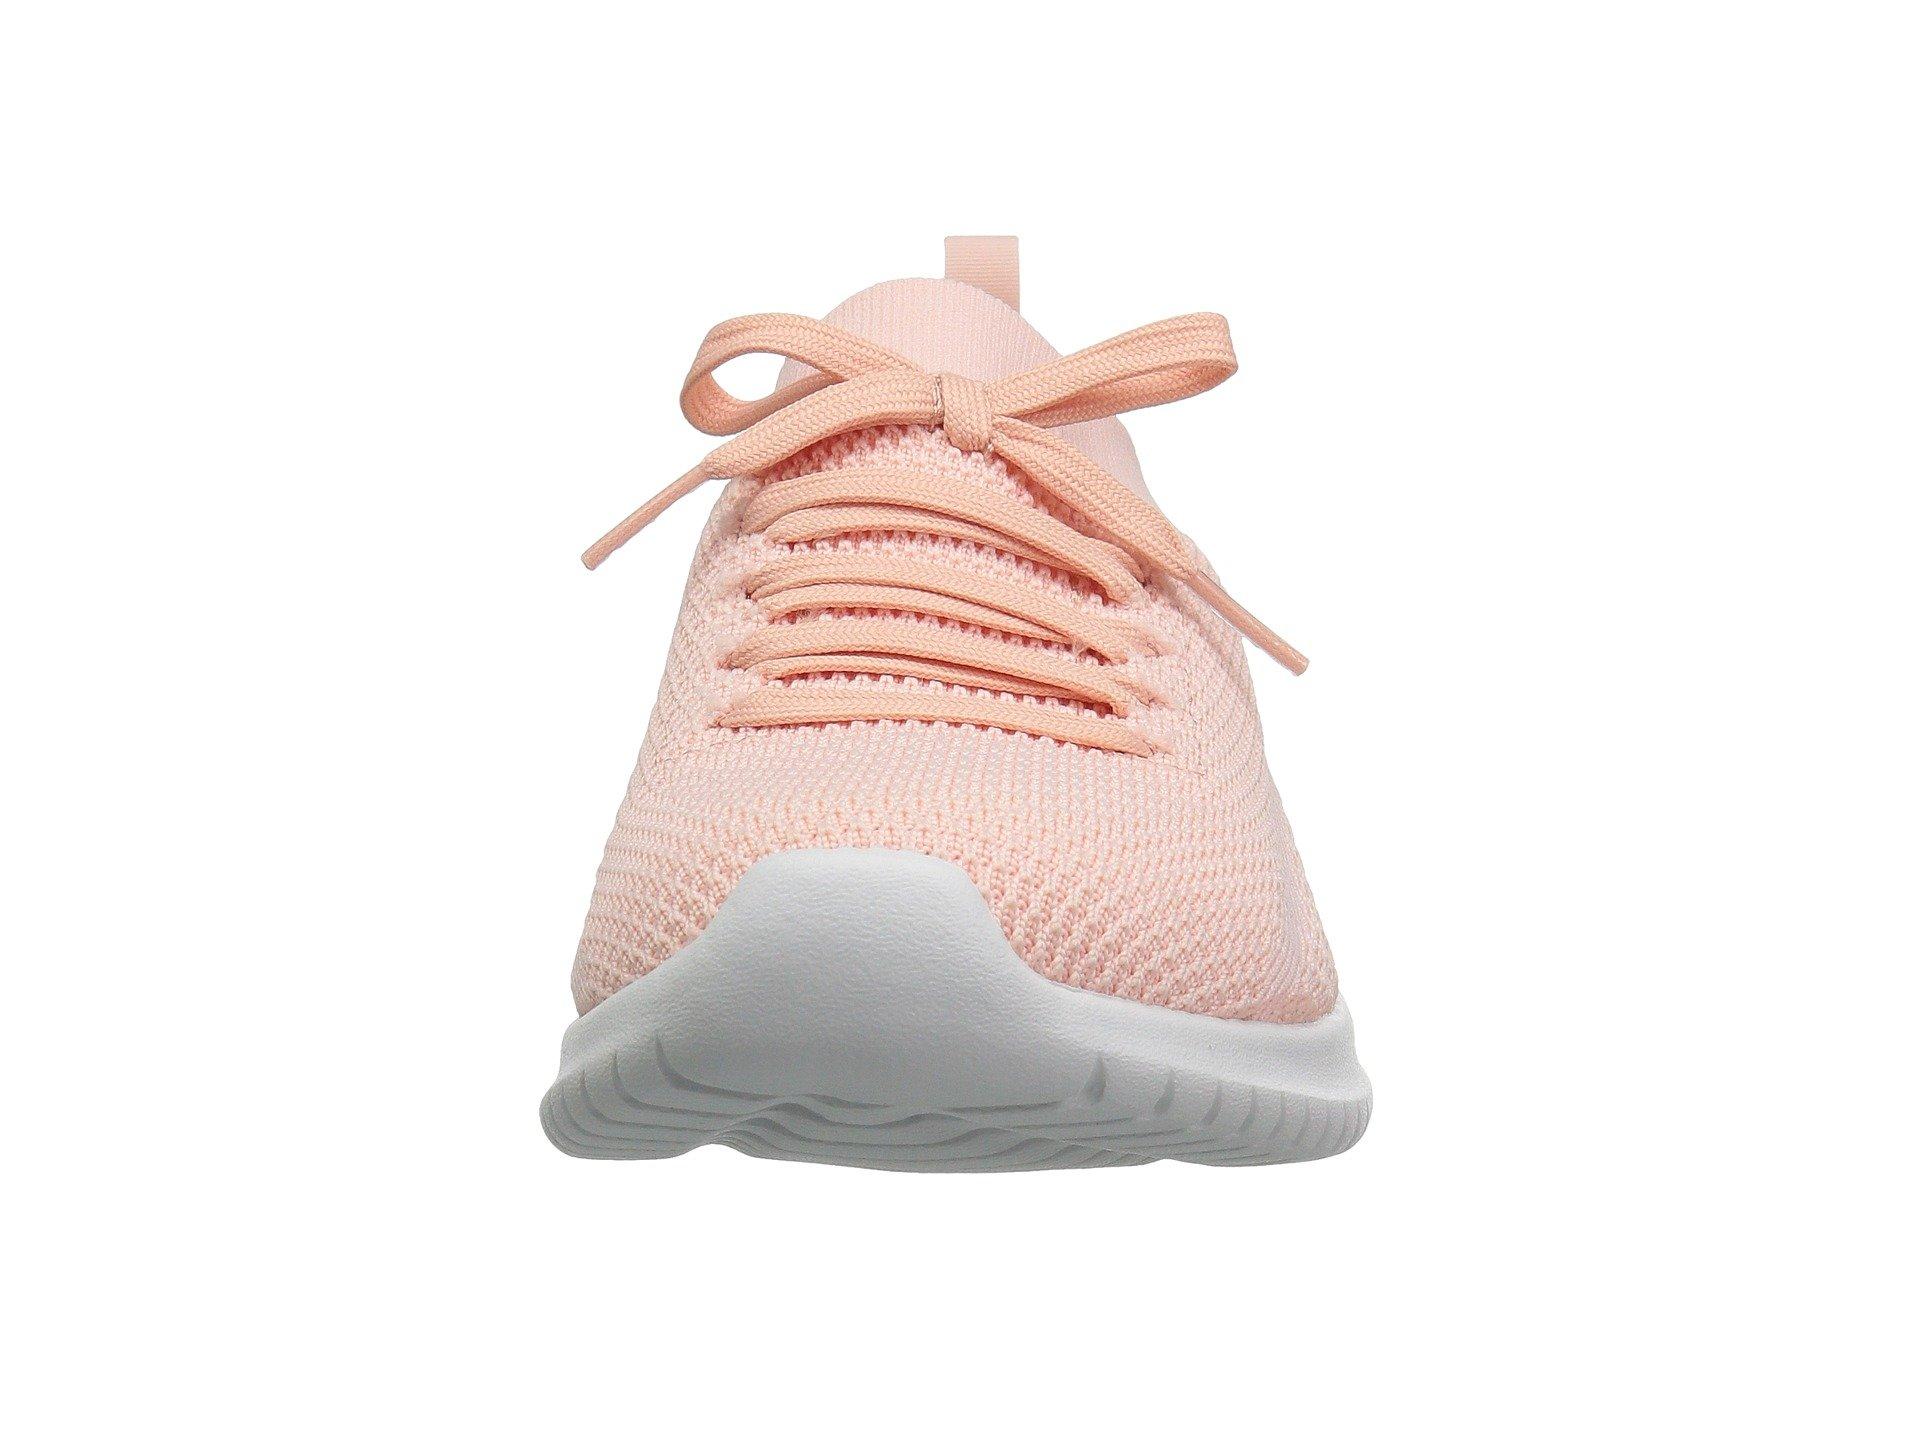 Skechers Pink Light Flex Statements Ultra qCrqpxOZ